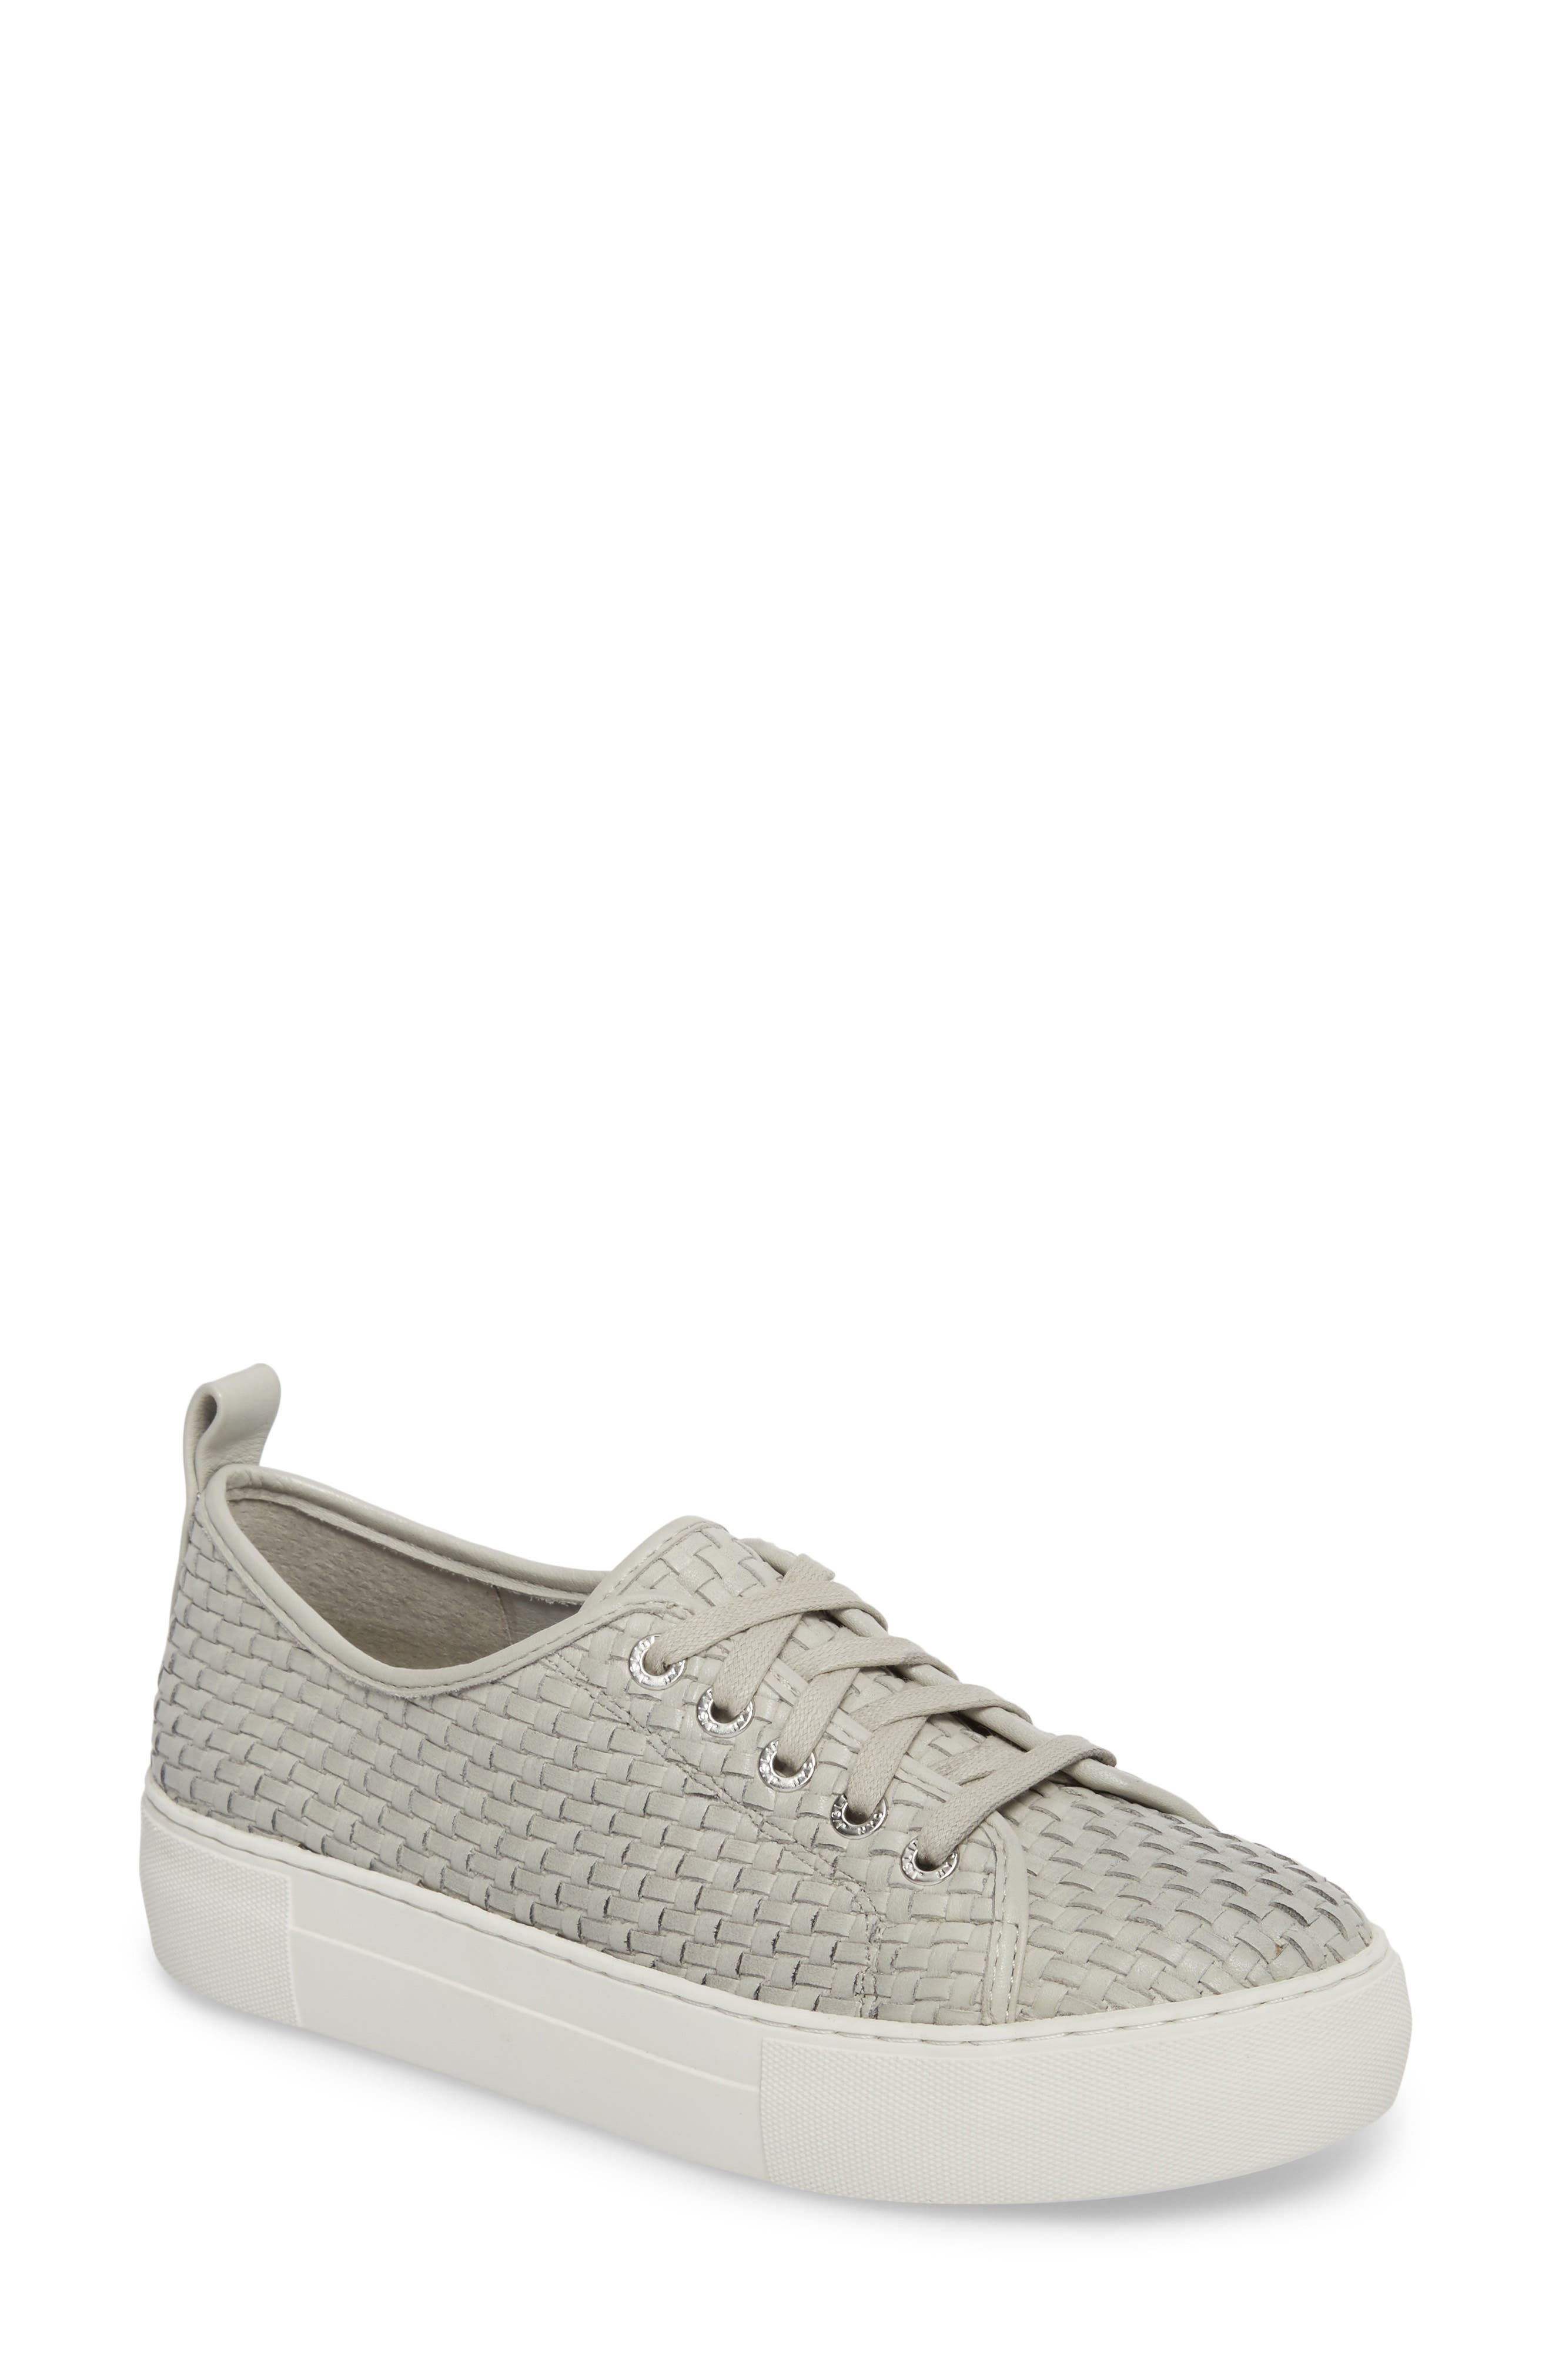 Artsy Woven Platform Sneaker,                             Main thumbnail 1, color,                             Pale Grey Leather